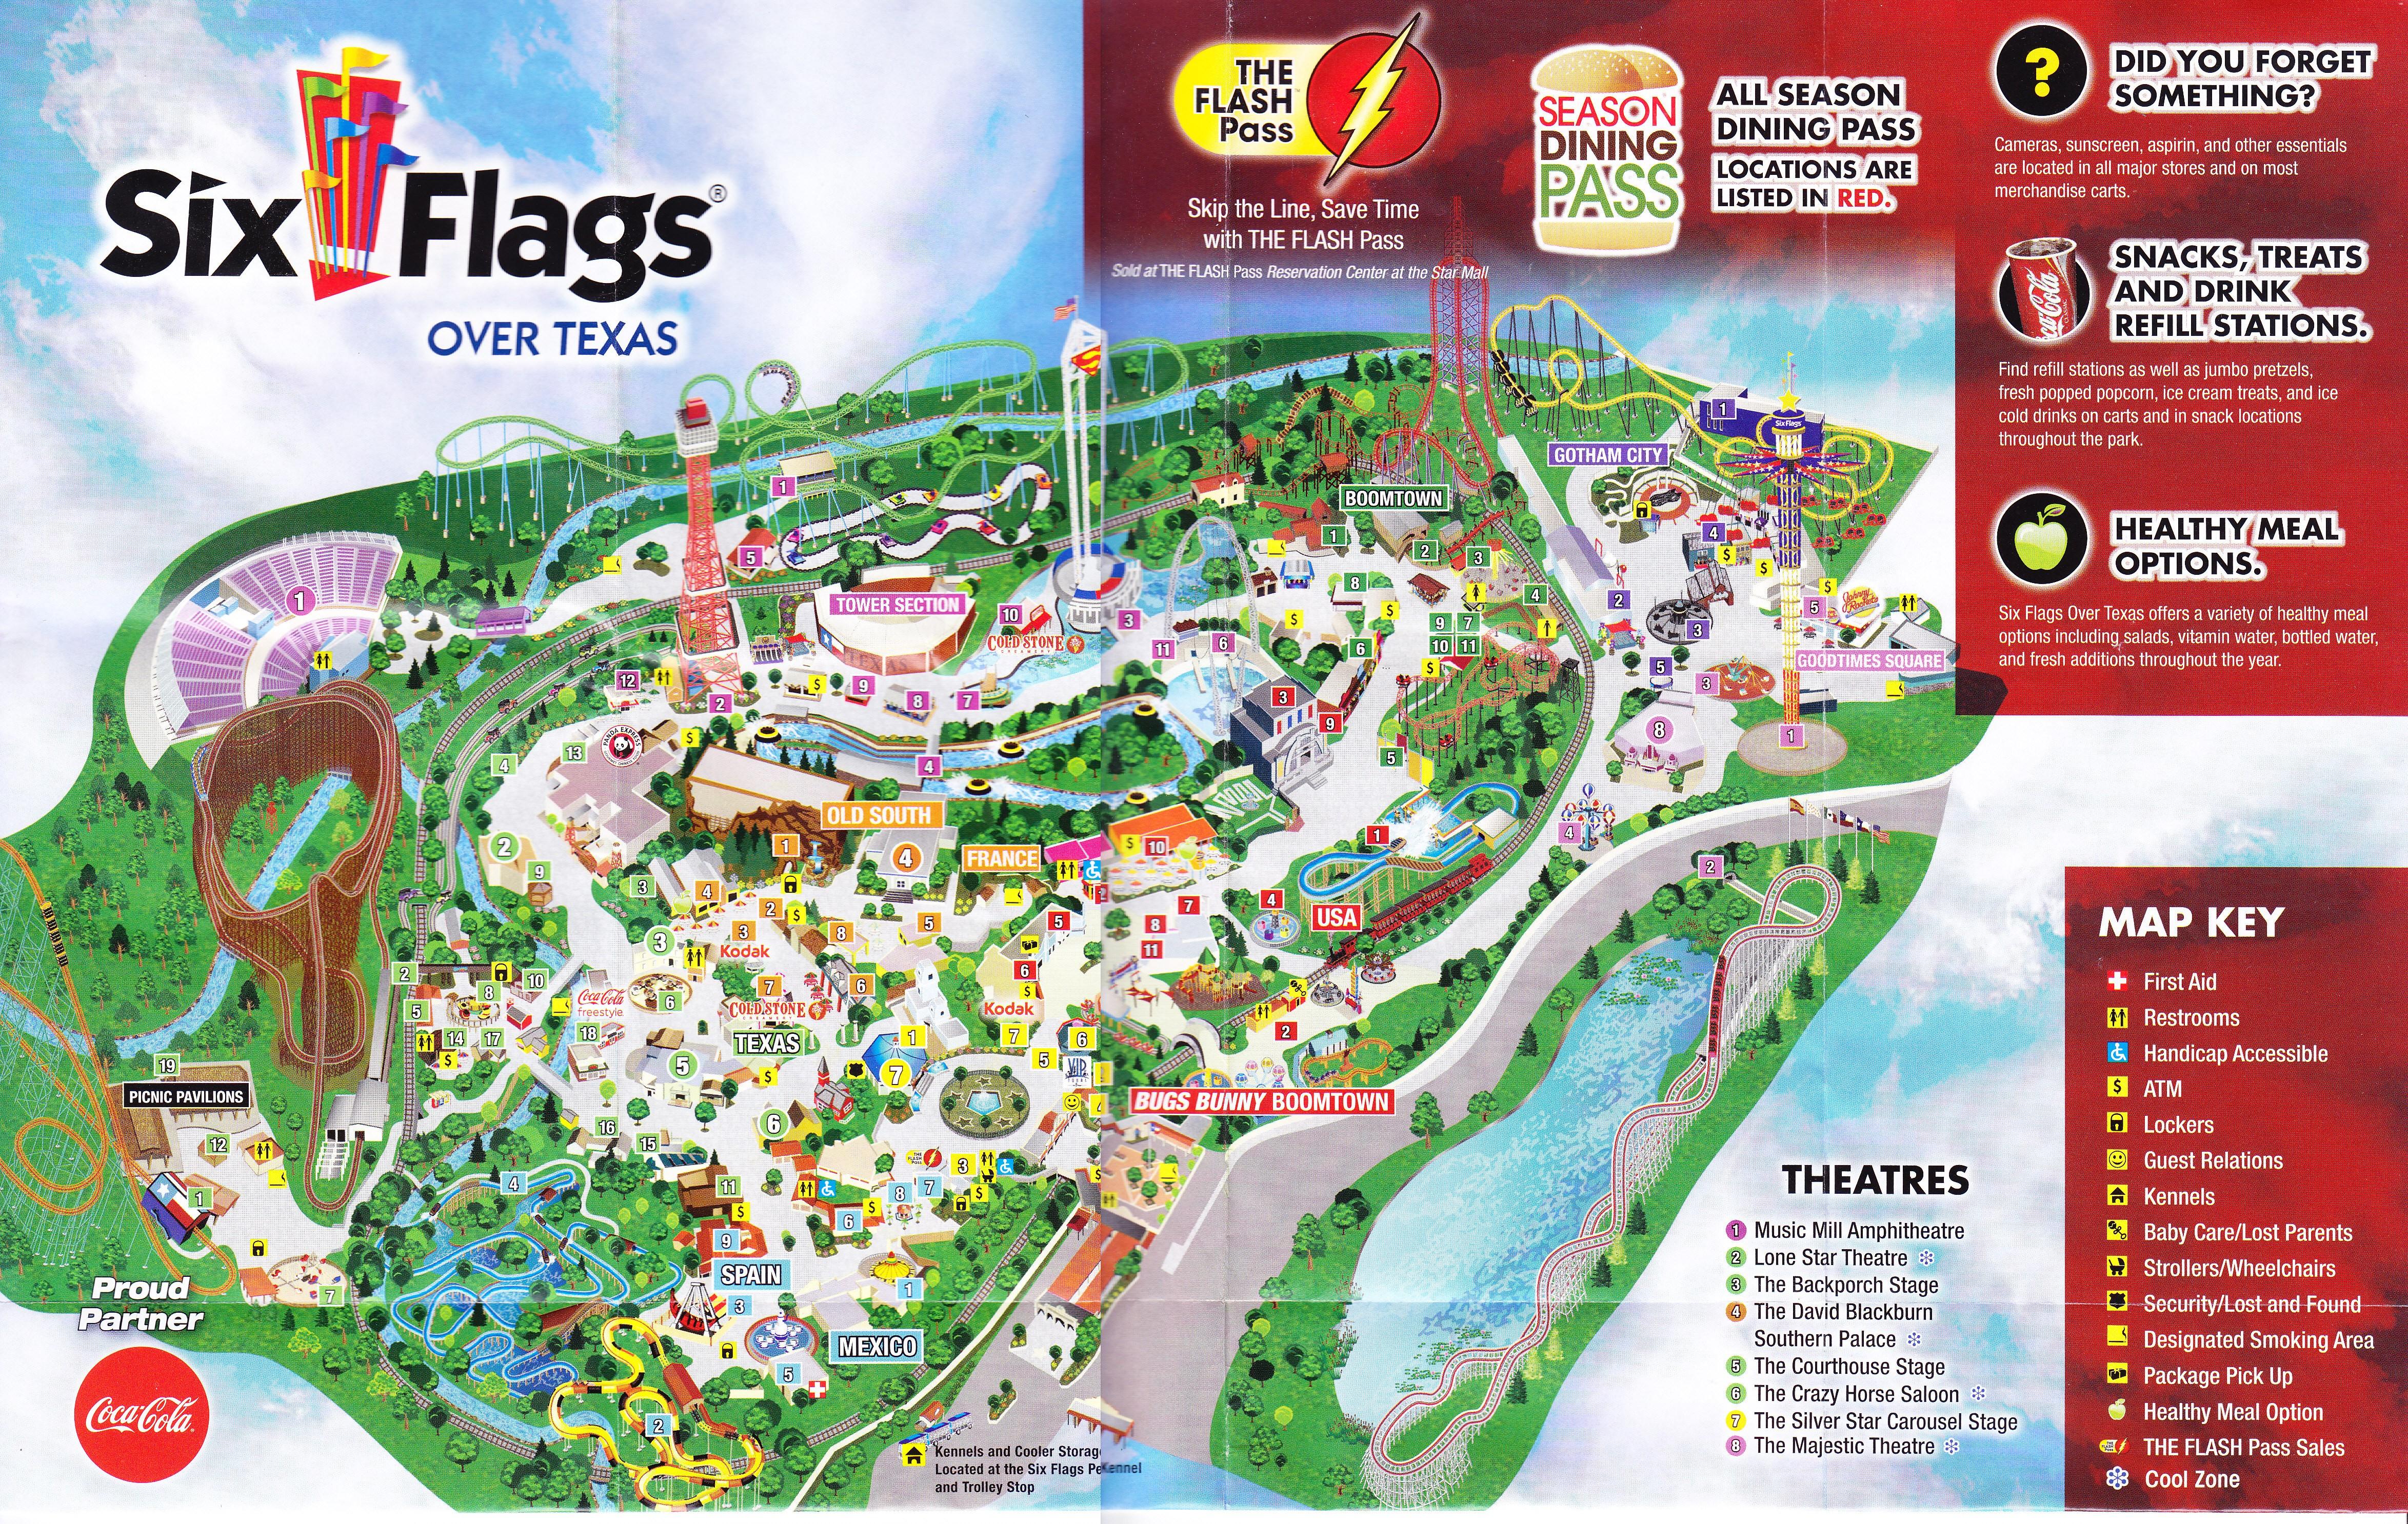 Maps 0007 12 Six Flags Over Texas Map | Settoplinux - Six Flags Over Texas Map App